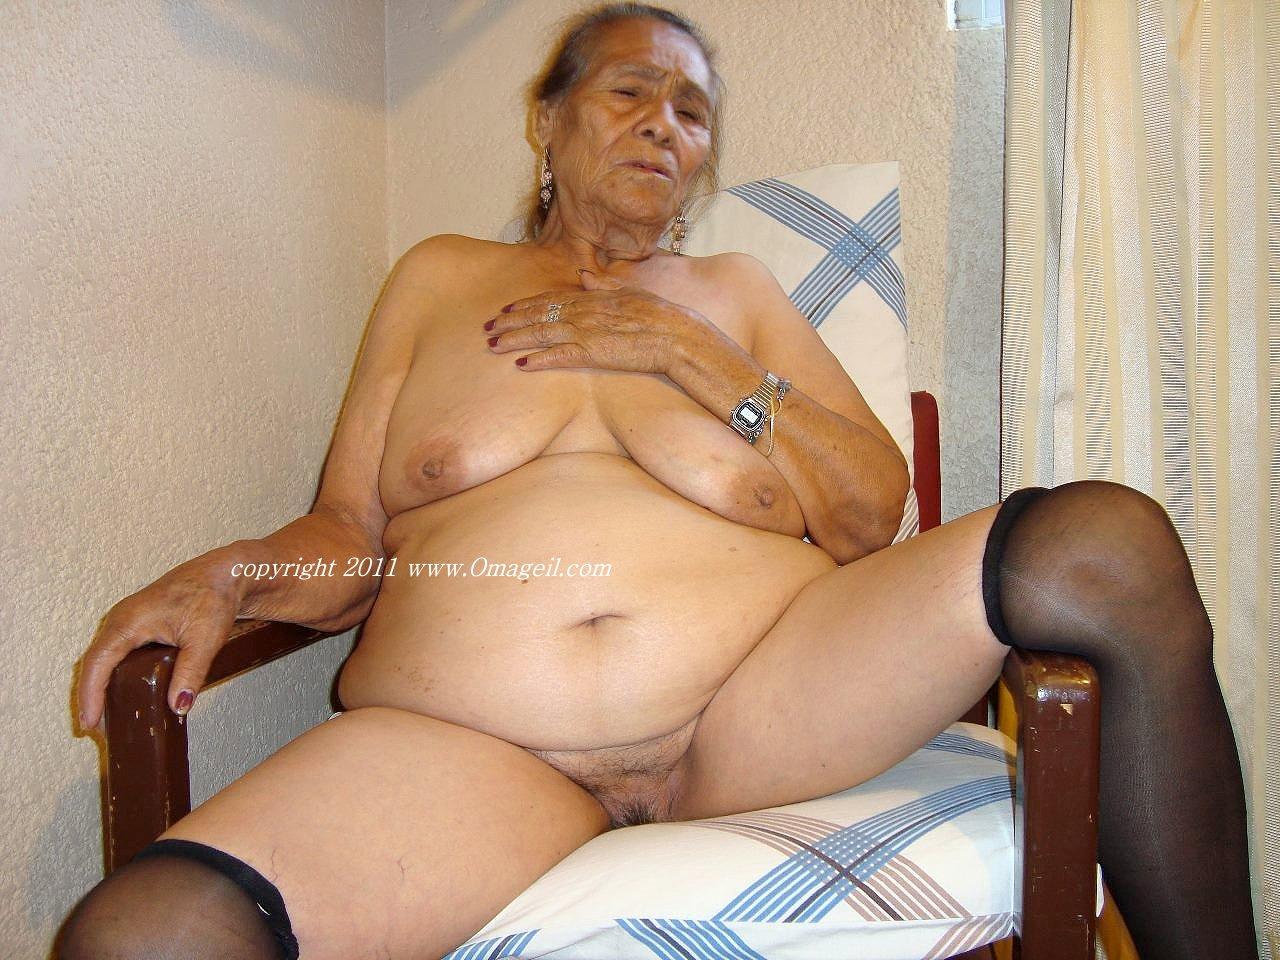 Black omageil granny was